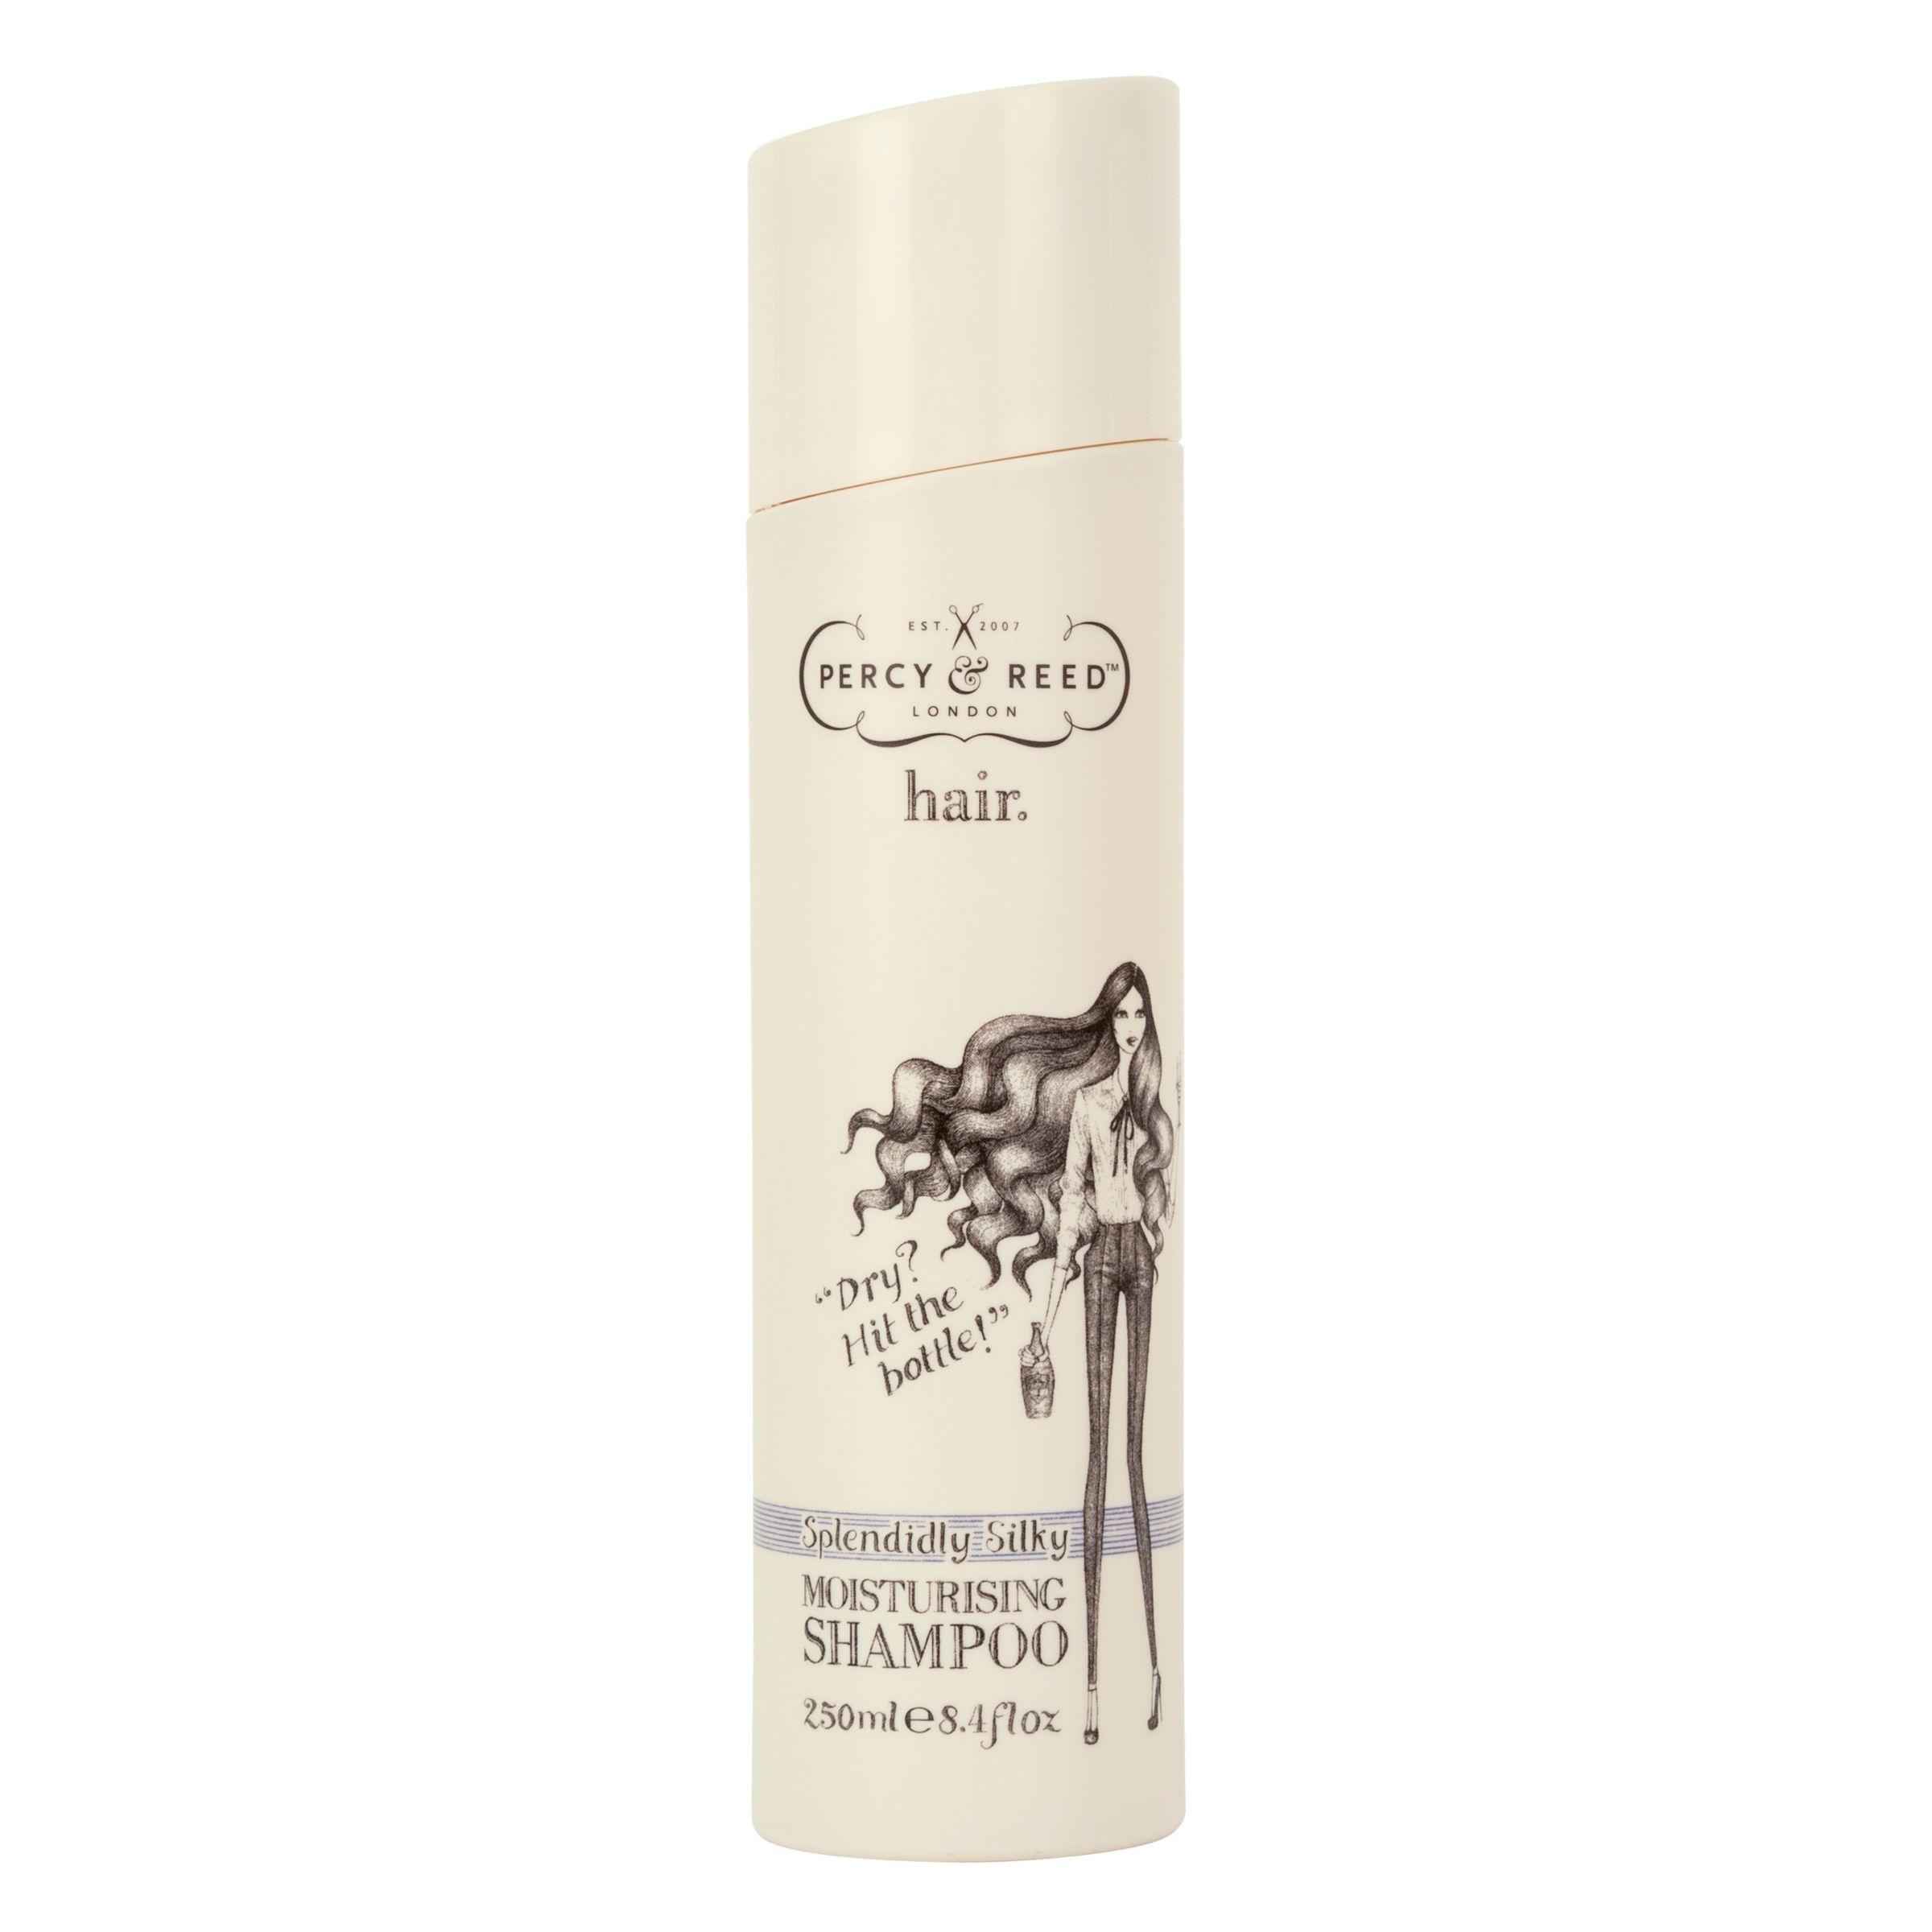 Percy & Reed Percy & Reed Splendidly Silky Moisturising Shampoo, 250ml